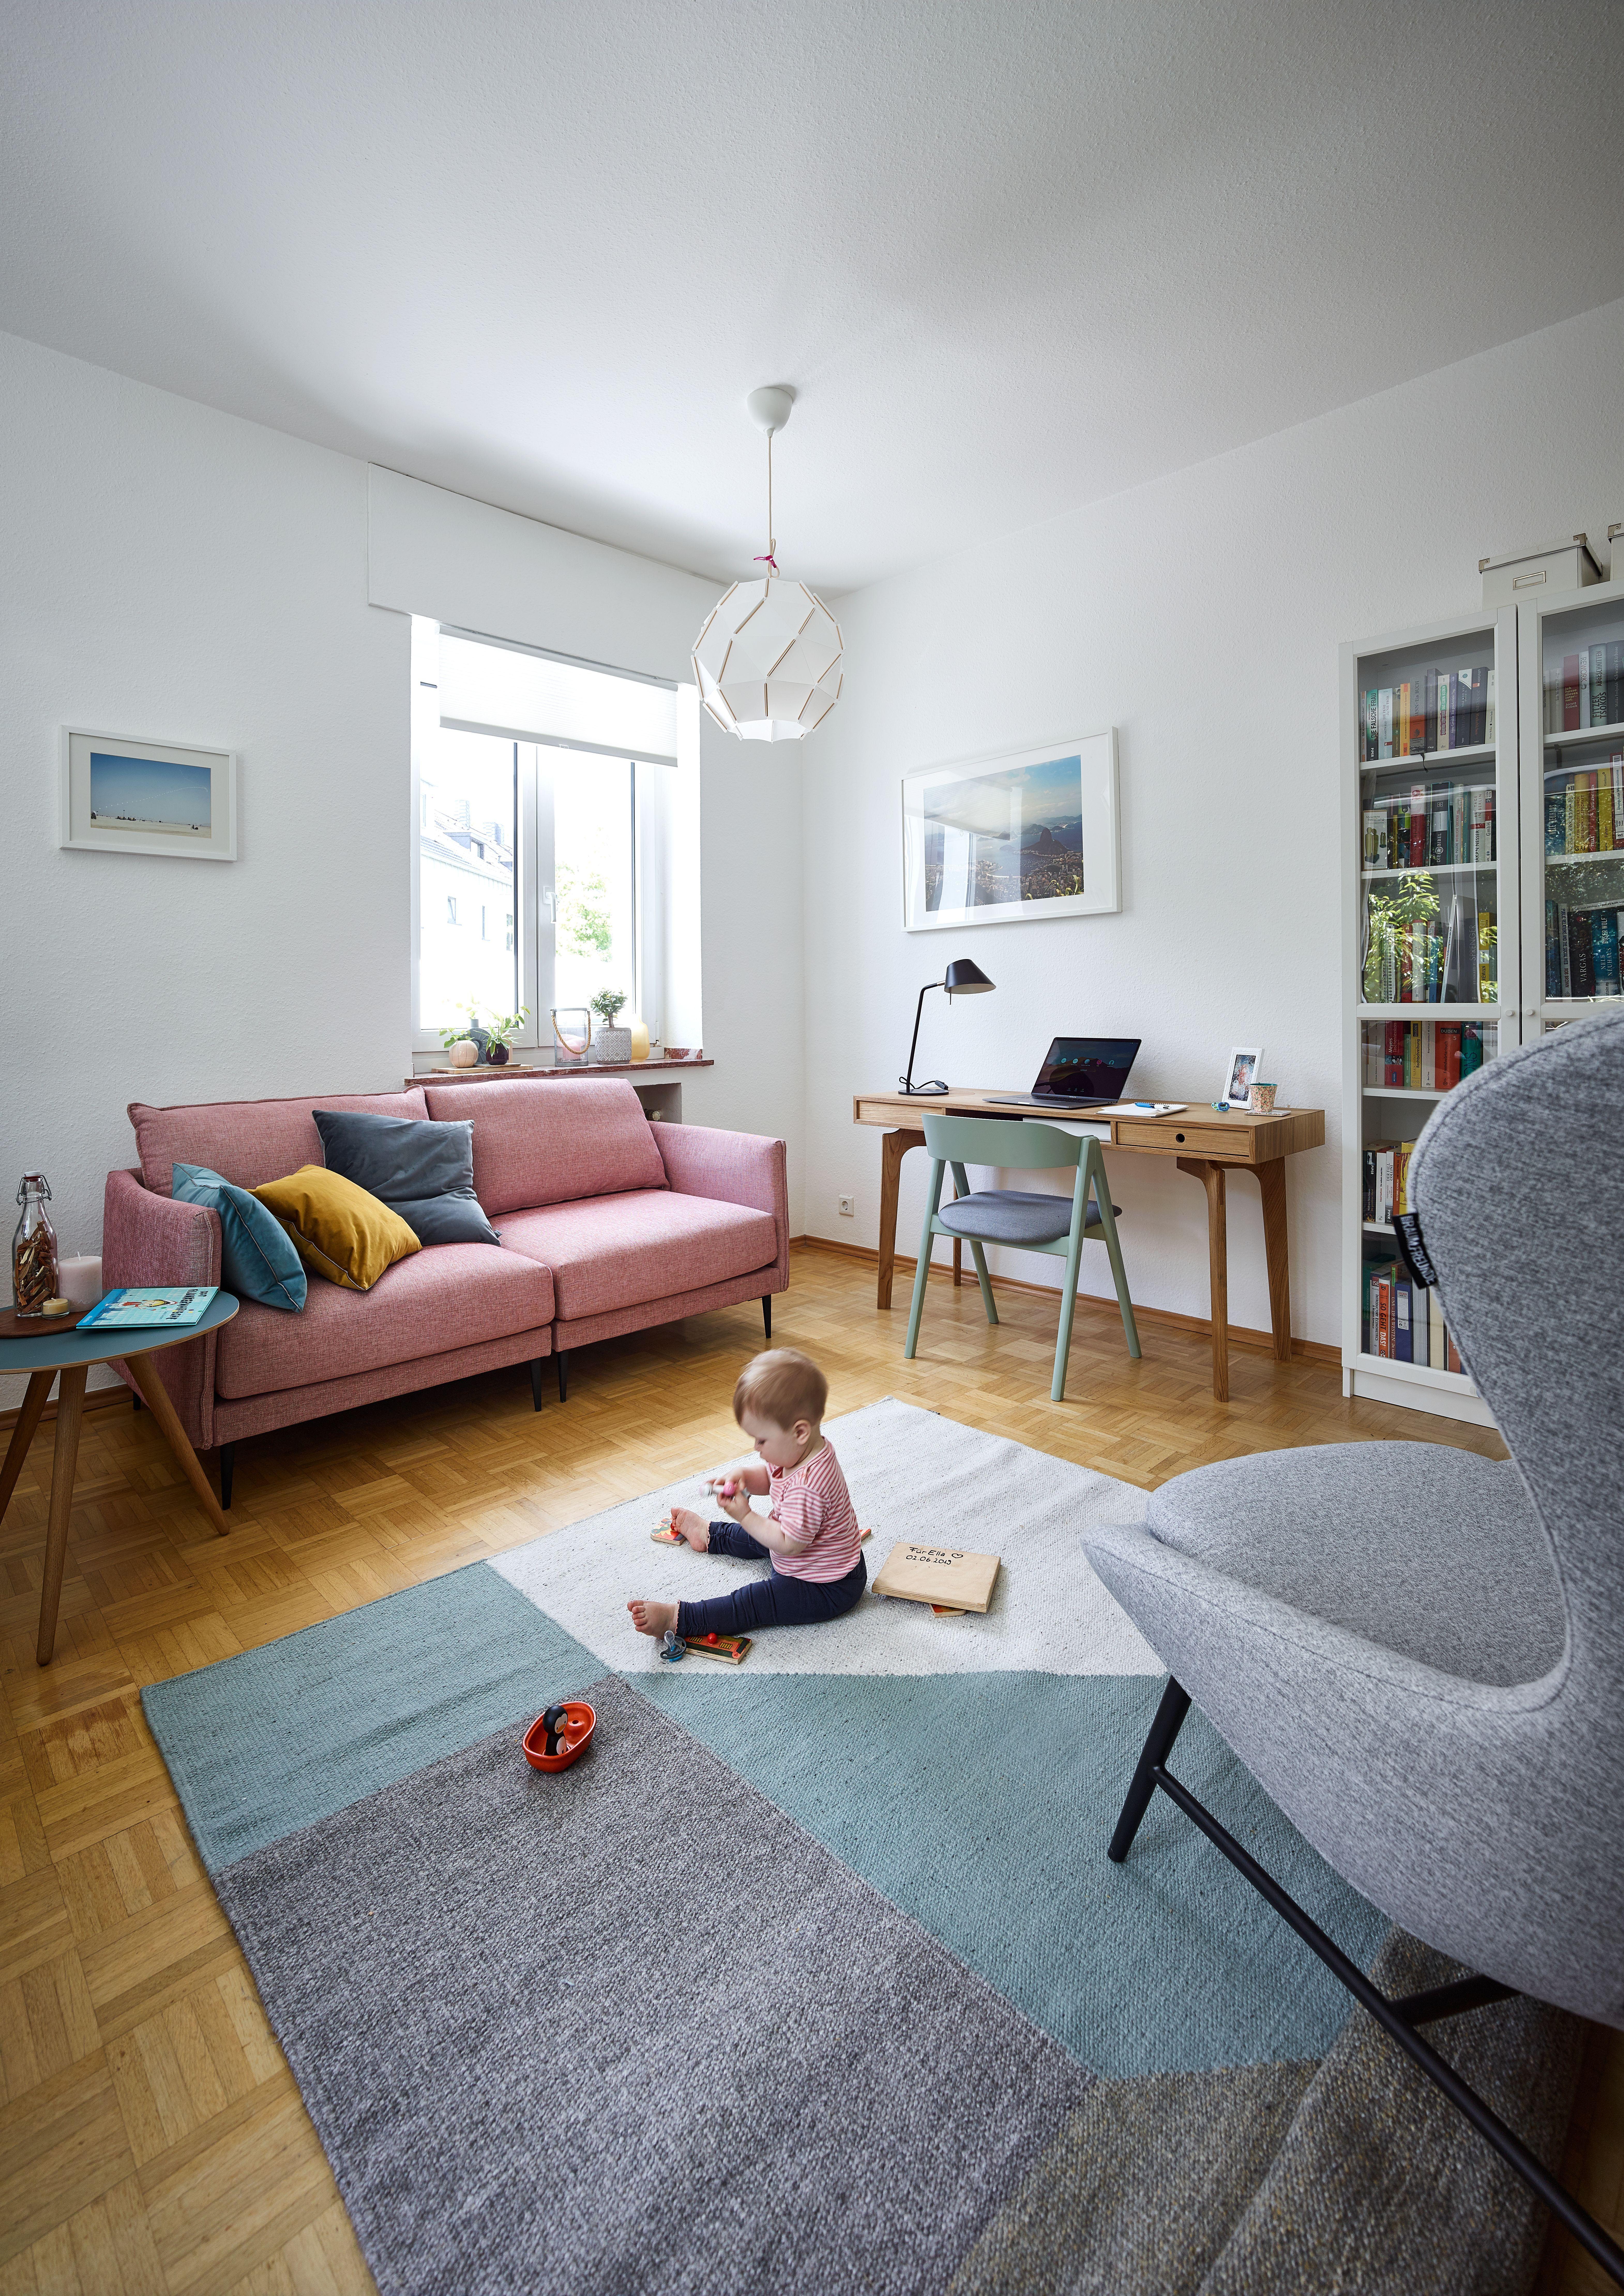 Raum Freunde Linn Haus Deko 2 Sitzer Sofa Zuhause